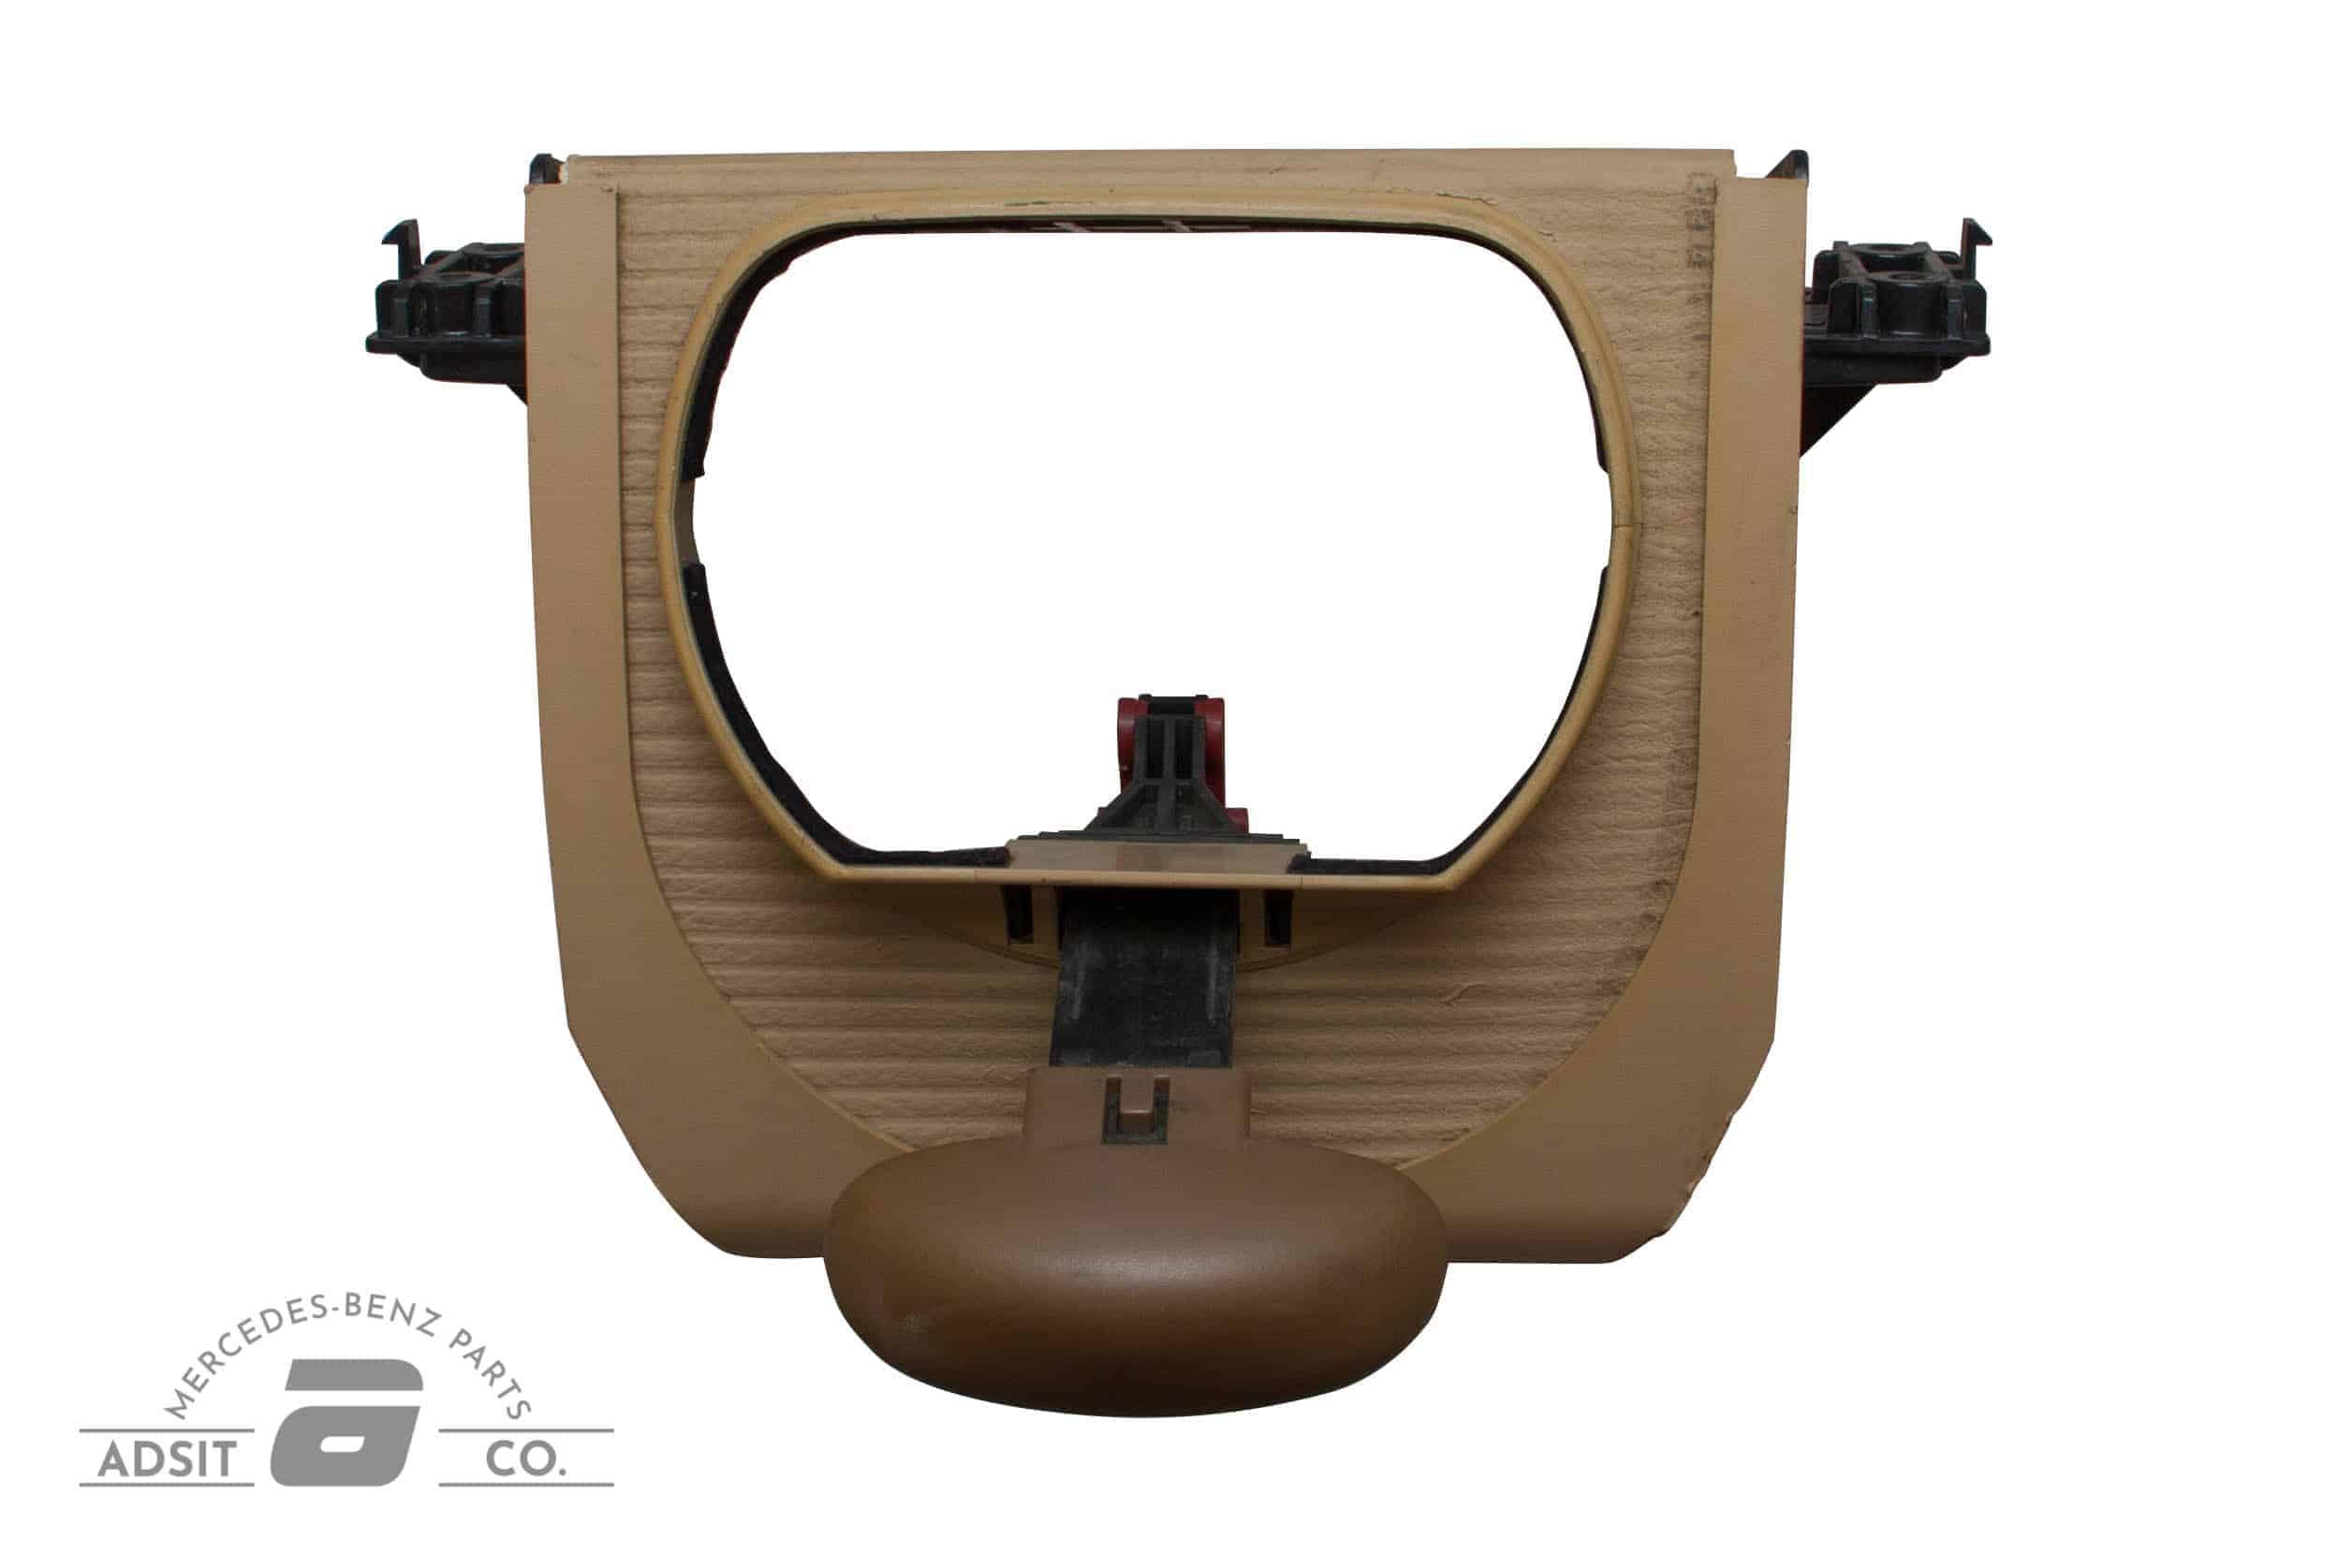 Mechanical Steering Wheel Height Adjust Cover W/ Grip